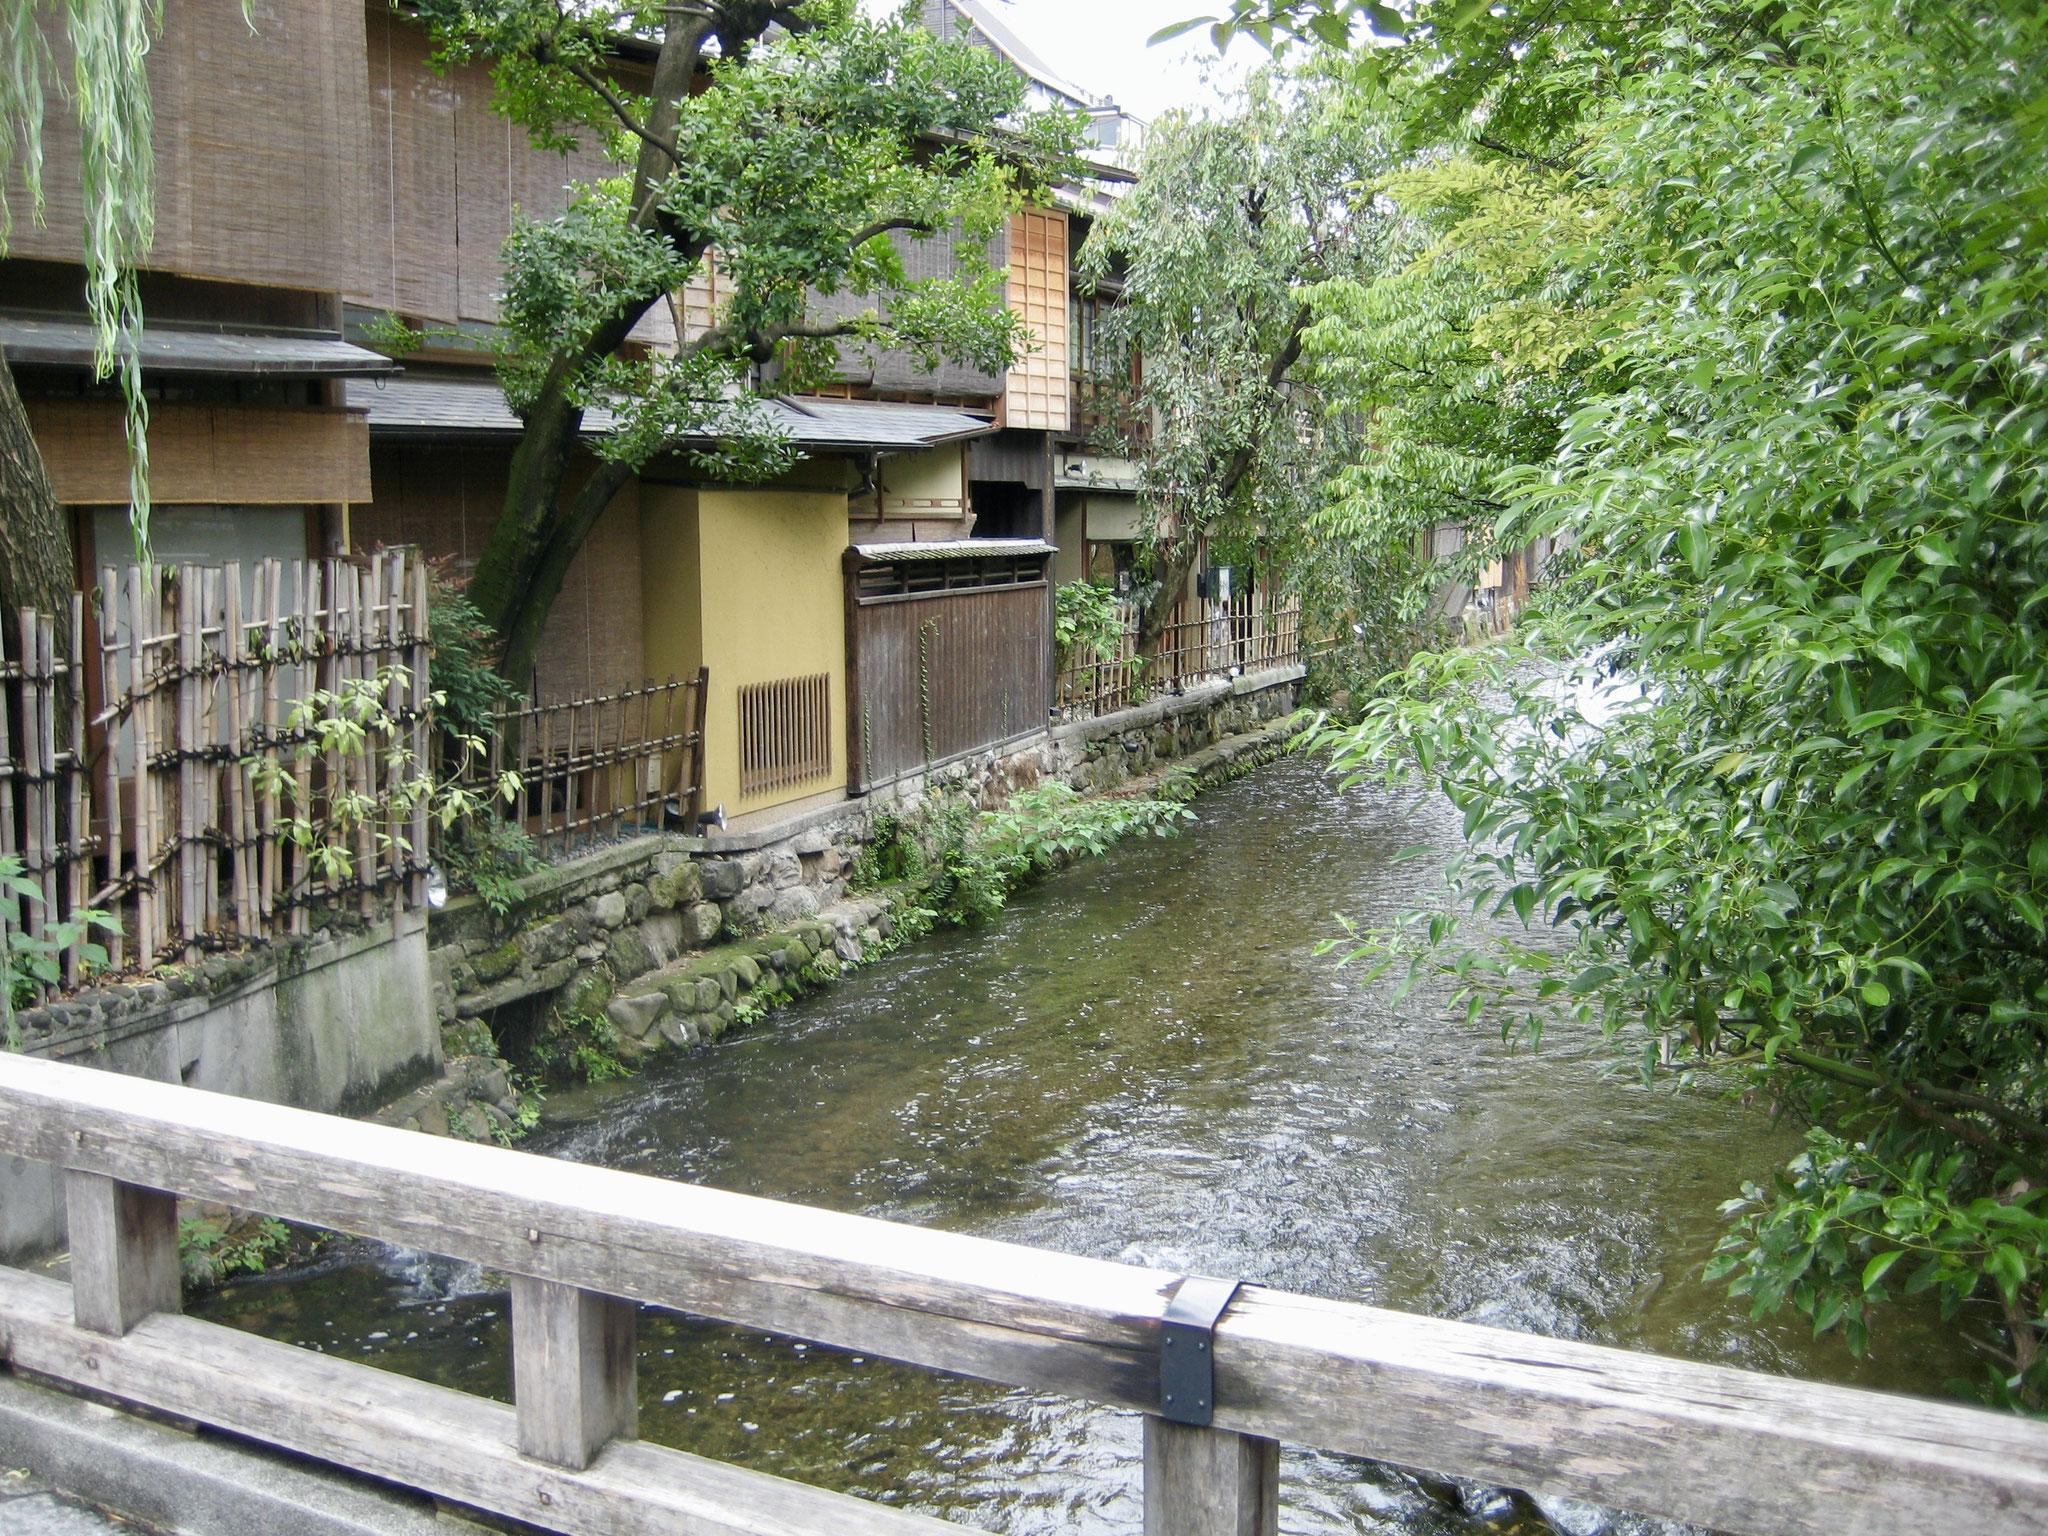 Kamogama River back street byway, Kyoto